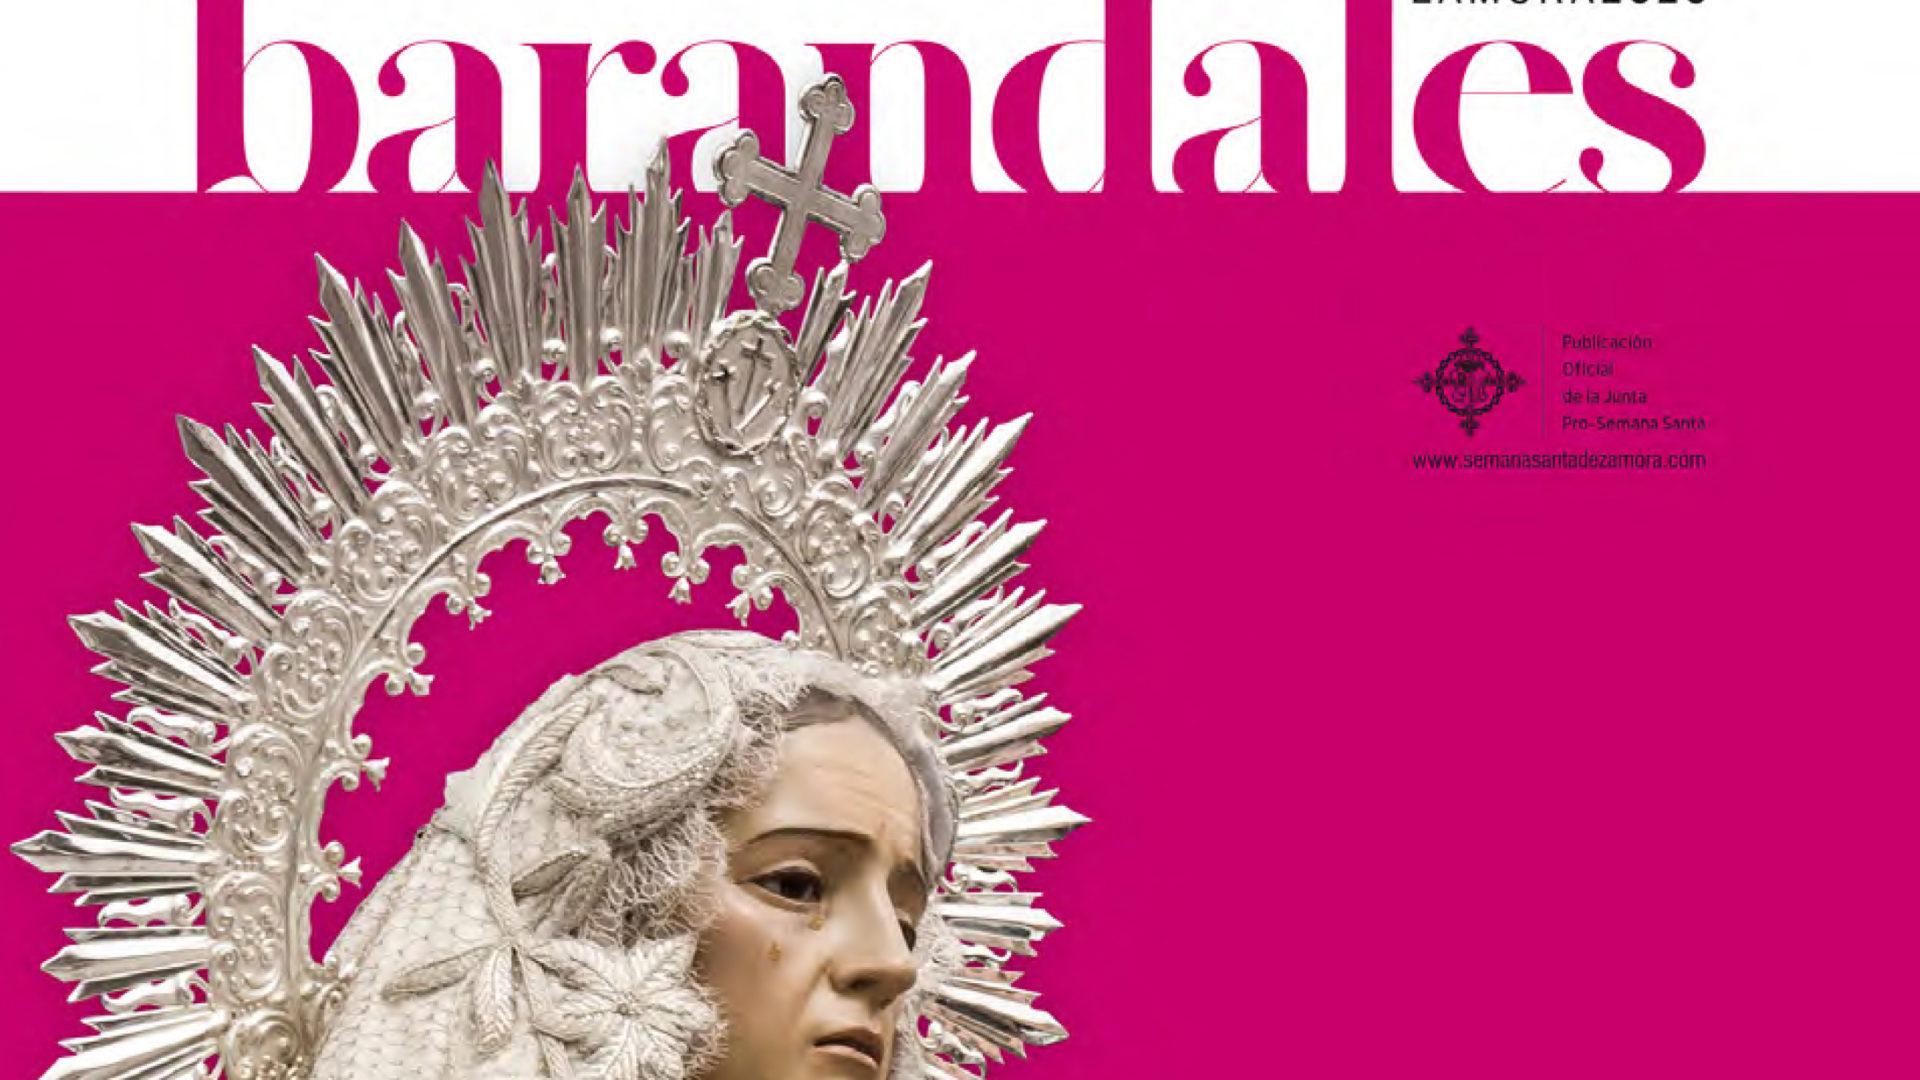 BARANDALES 2020